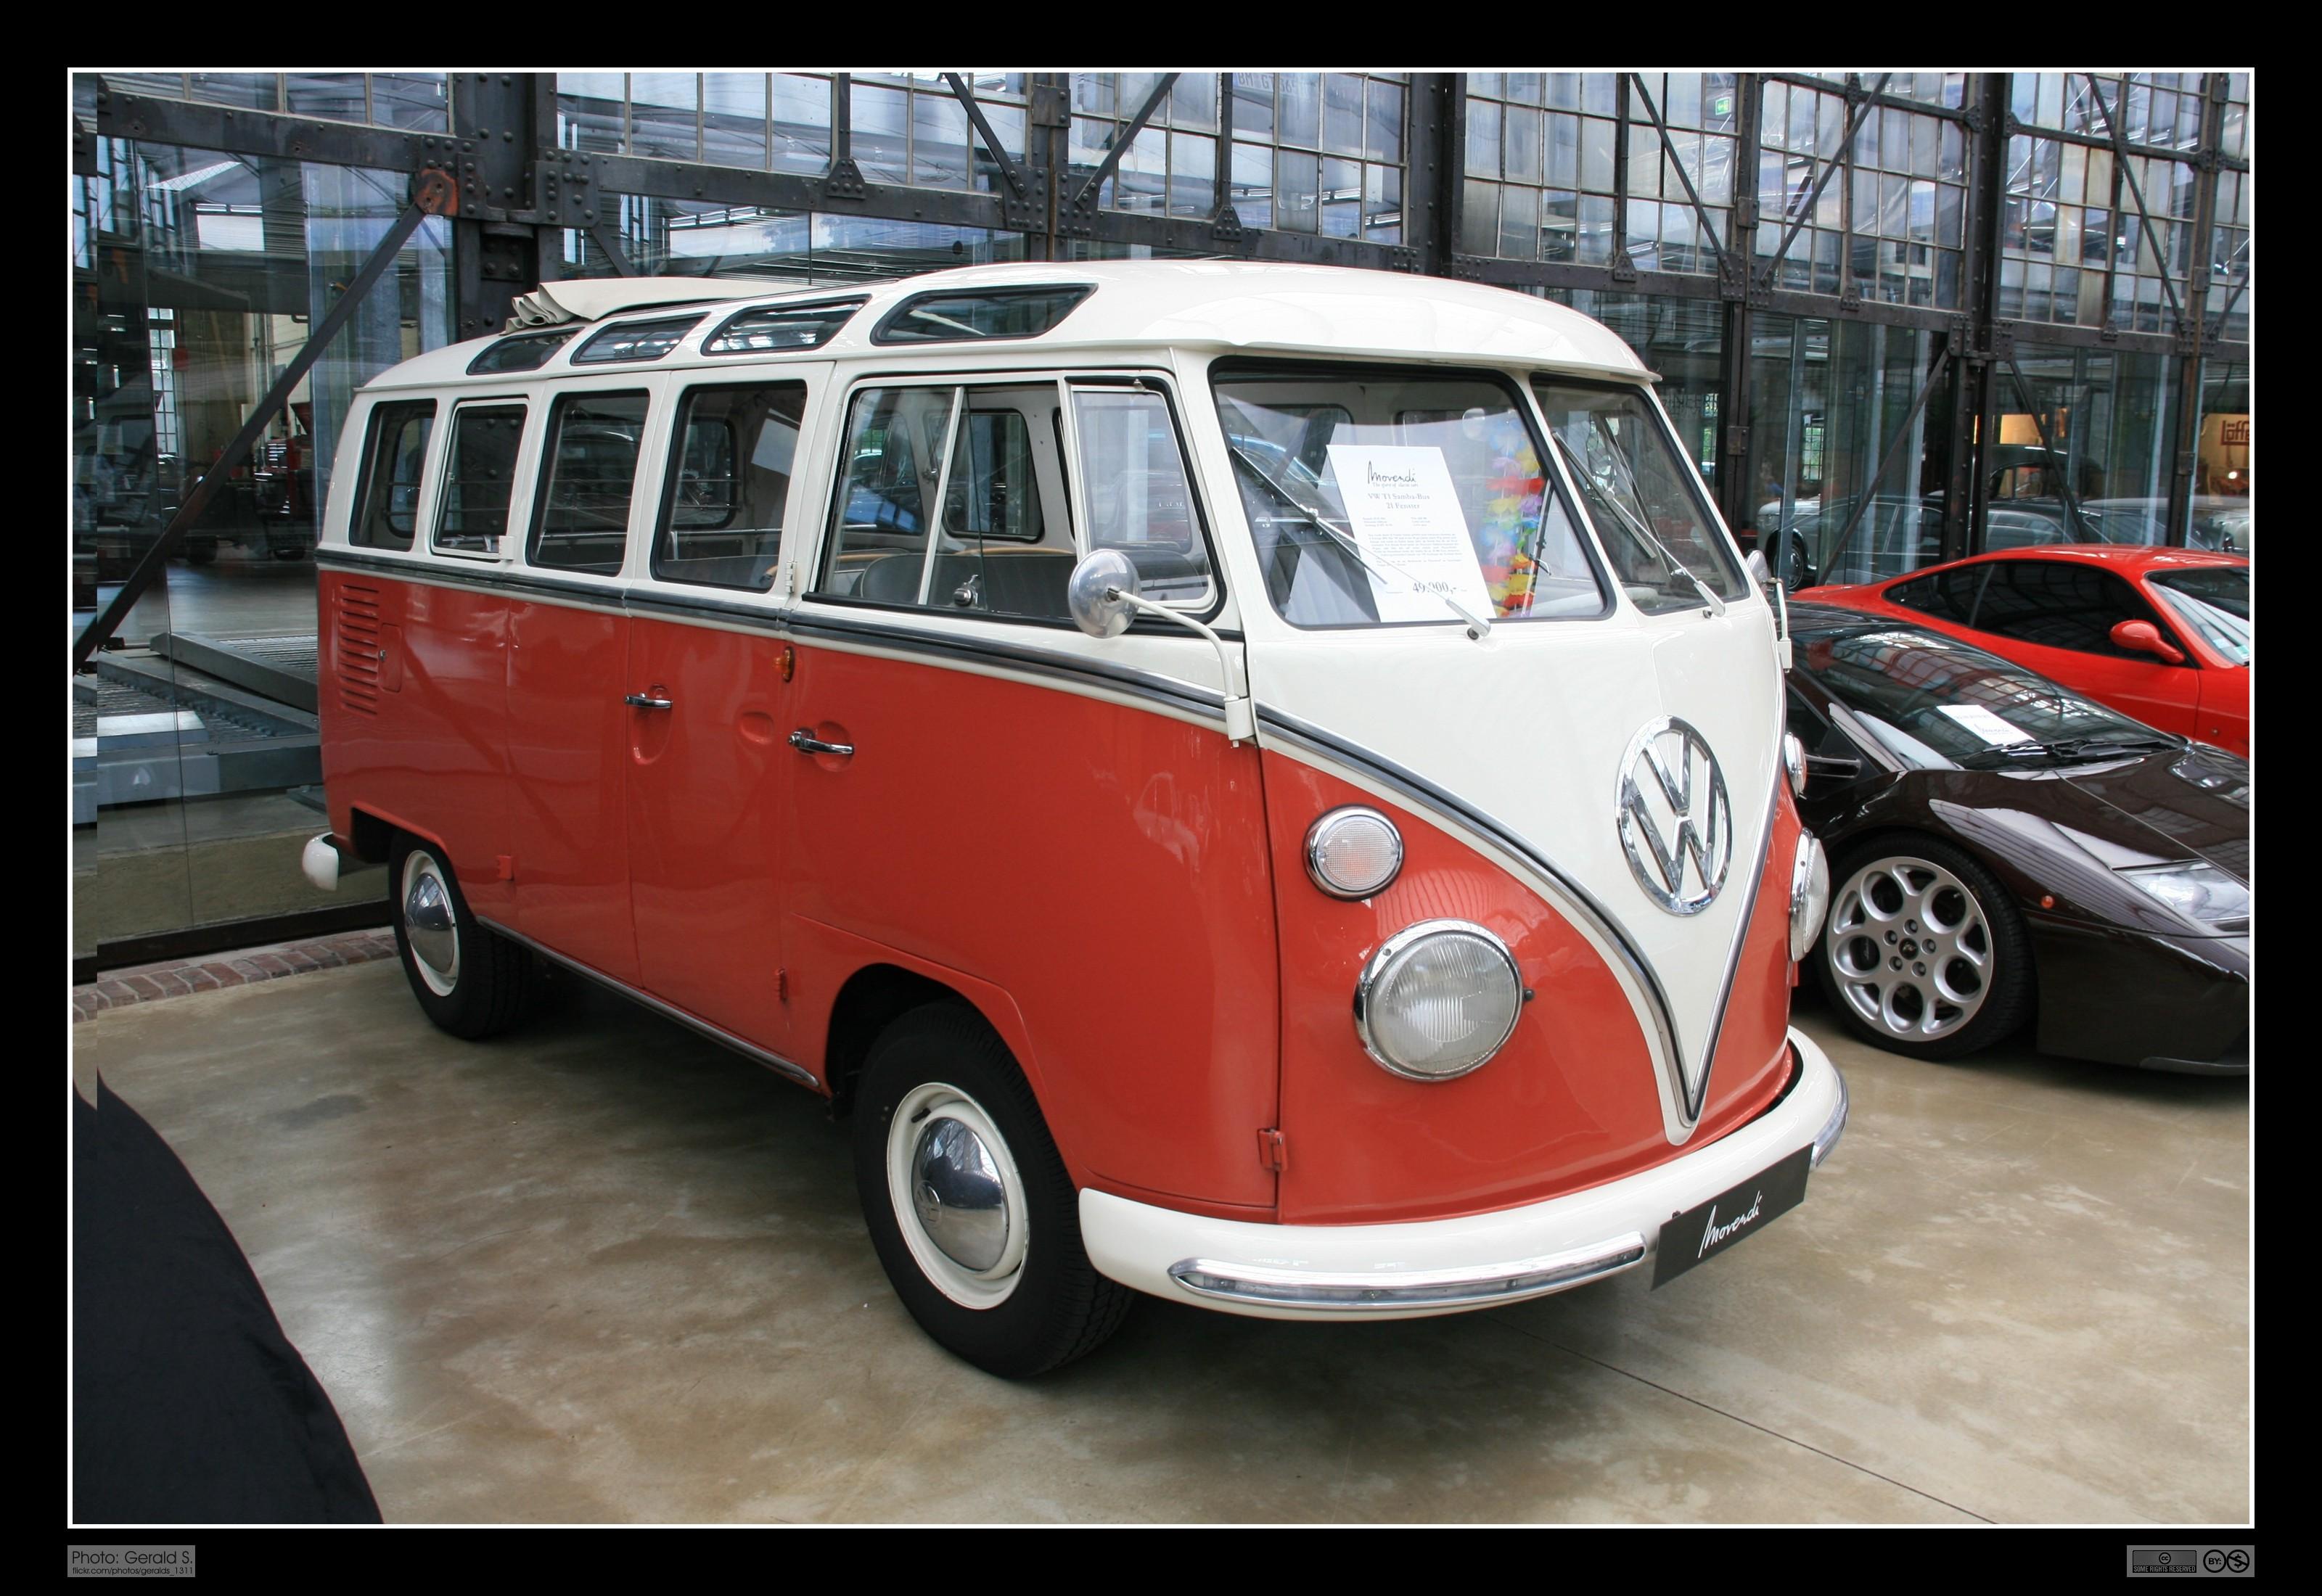 1964 volkswagen t1 samba bus 21 fenster 01 flickr. Black Bedroom Furniture Sets. Home Design Ideas